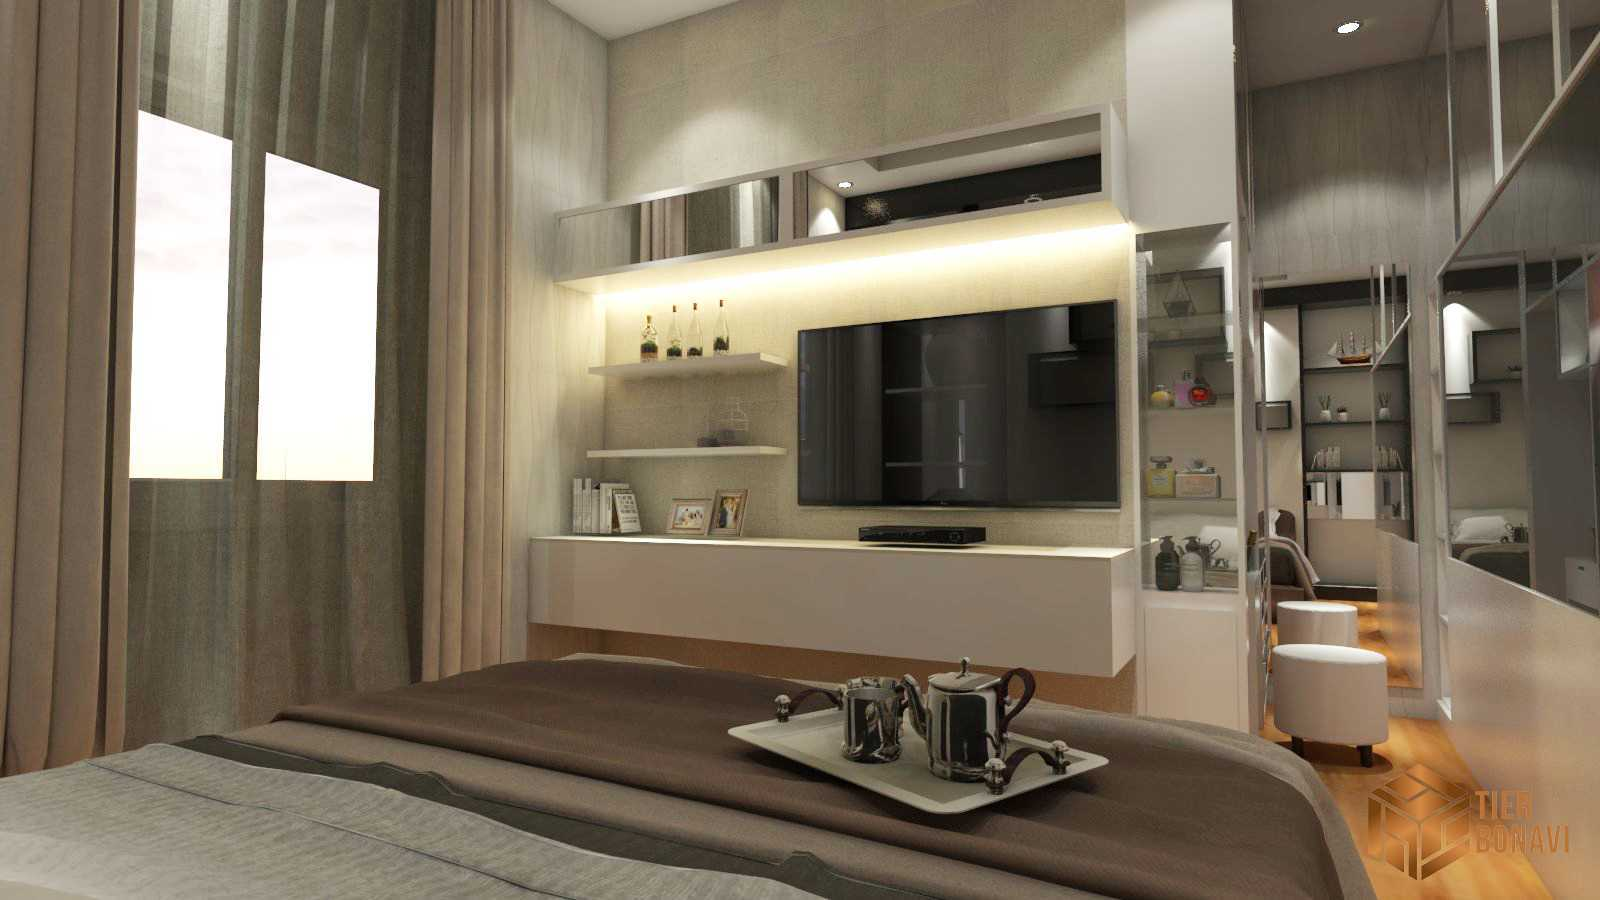 Tierbonavi Bedroom Jakarta, Daerah Khusus Ibukota Jakarta, Indonesia Jakarta, Daerah Khusus Ibukota Jakarta, Indonesia Tierbonavi-Bedroom  53471